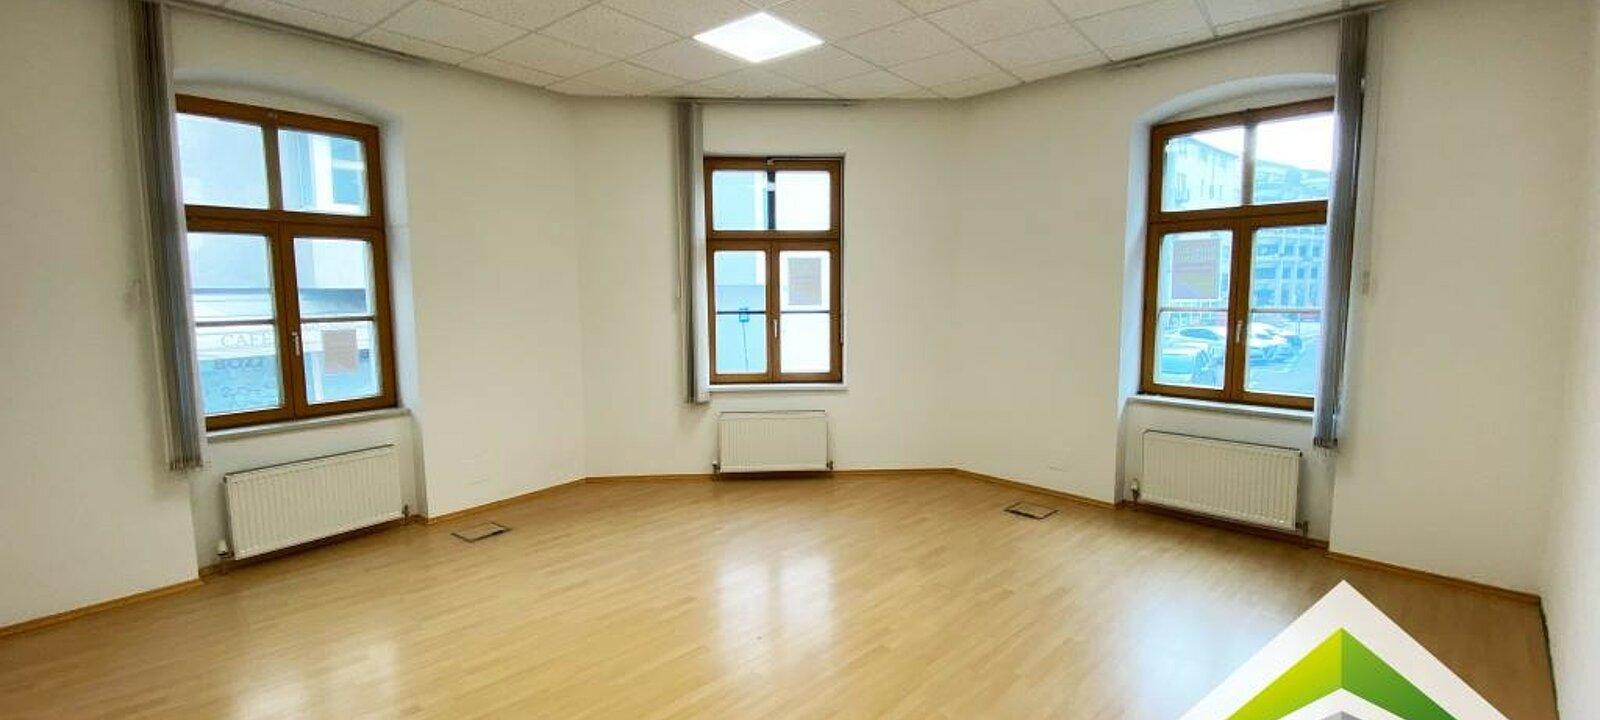 Büroraum groß